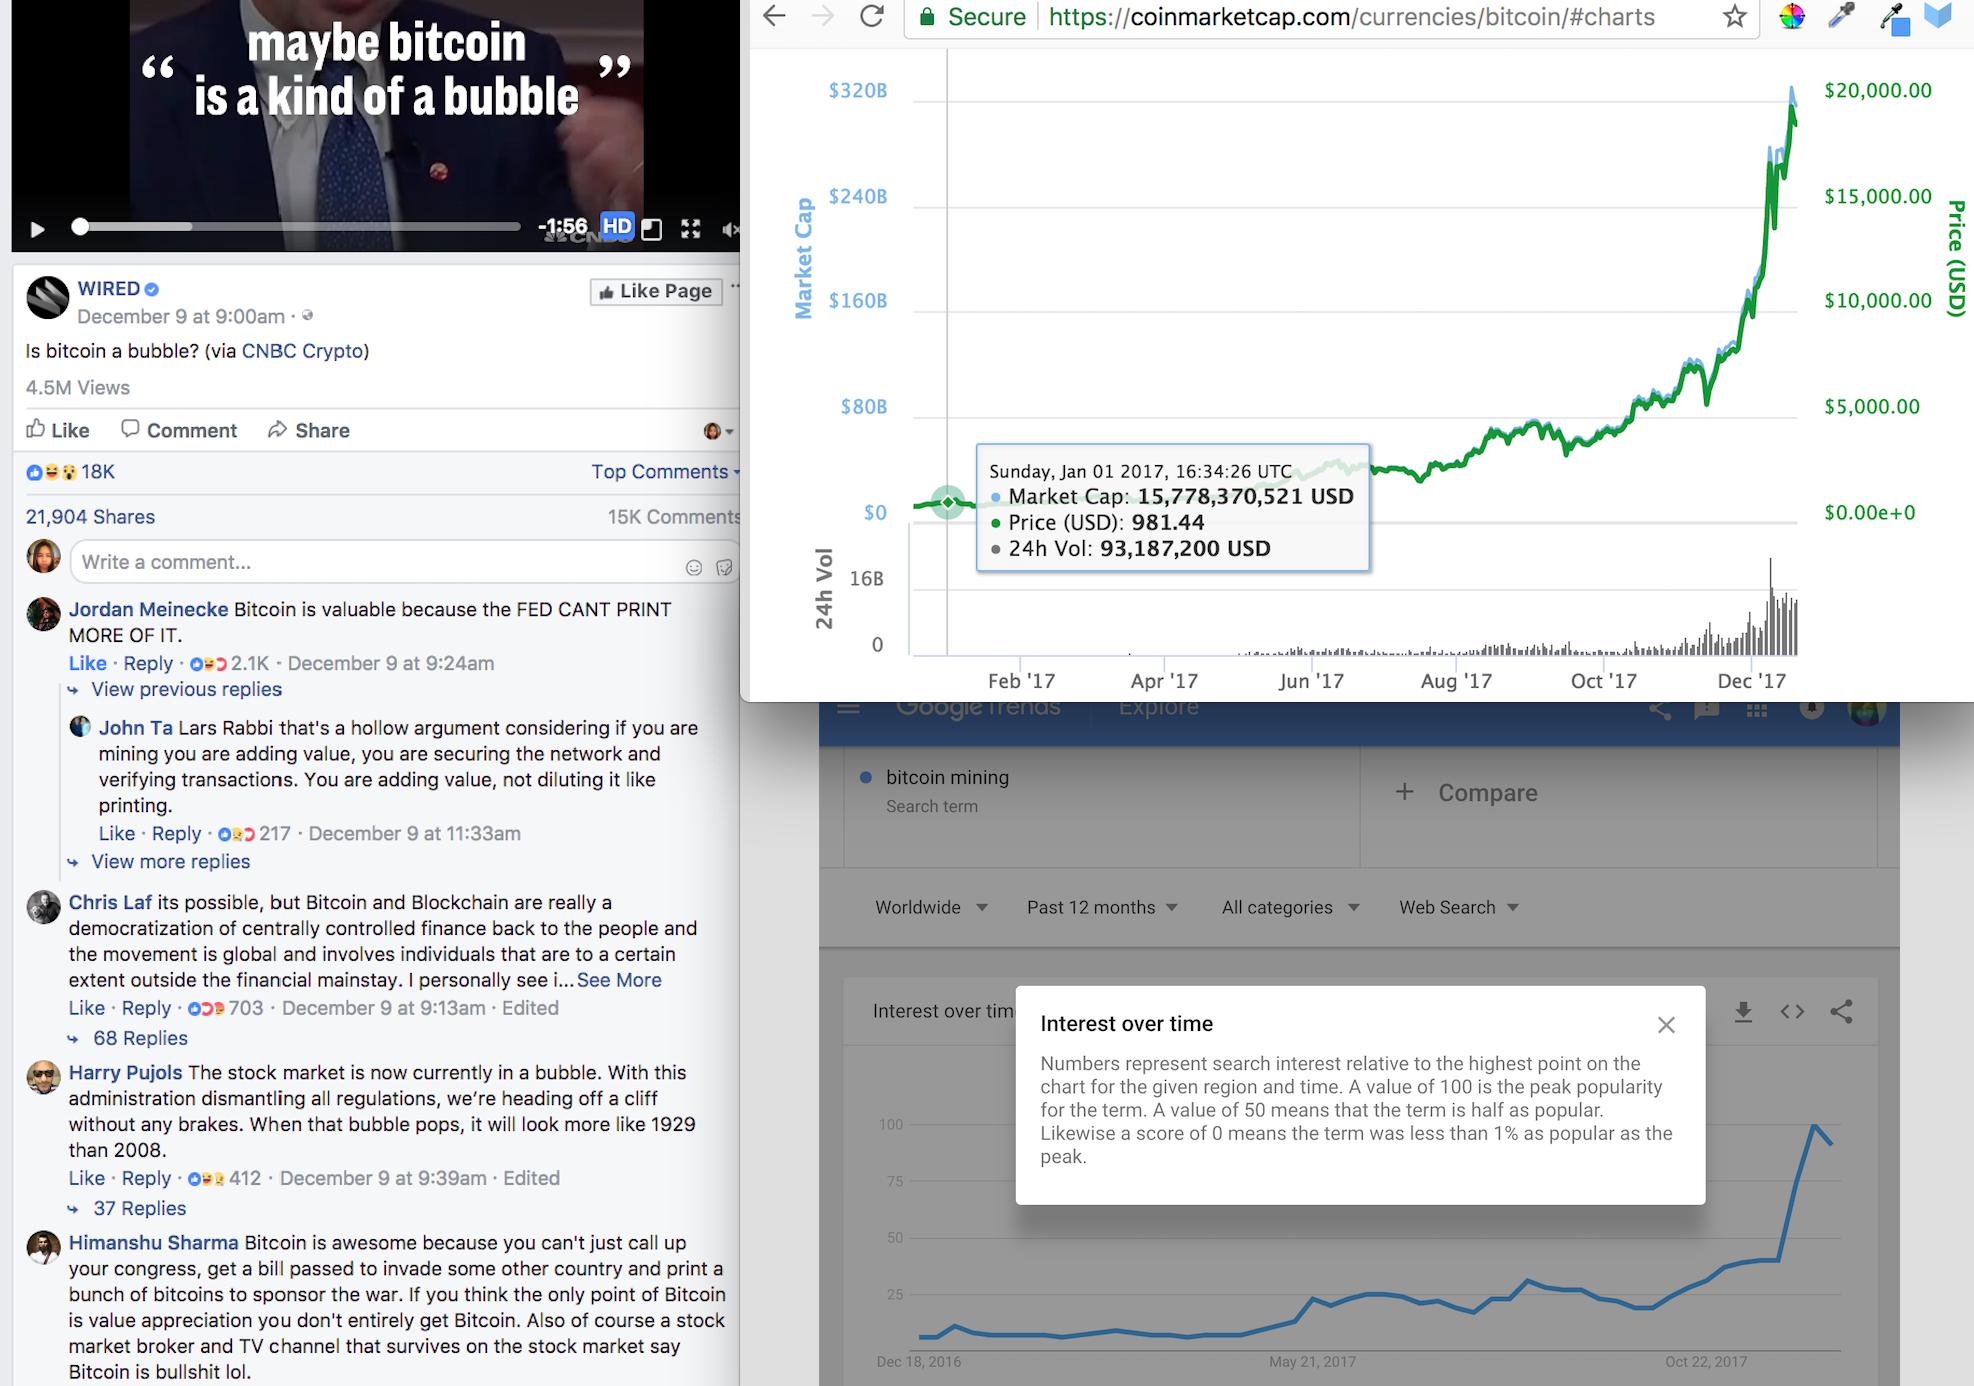 Is Bitcoin Cloud Mining Profitable? (HashFlare) - By